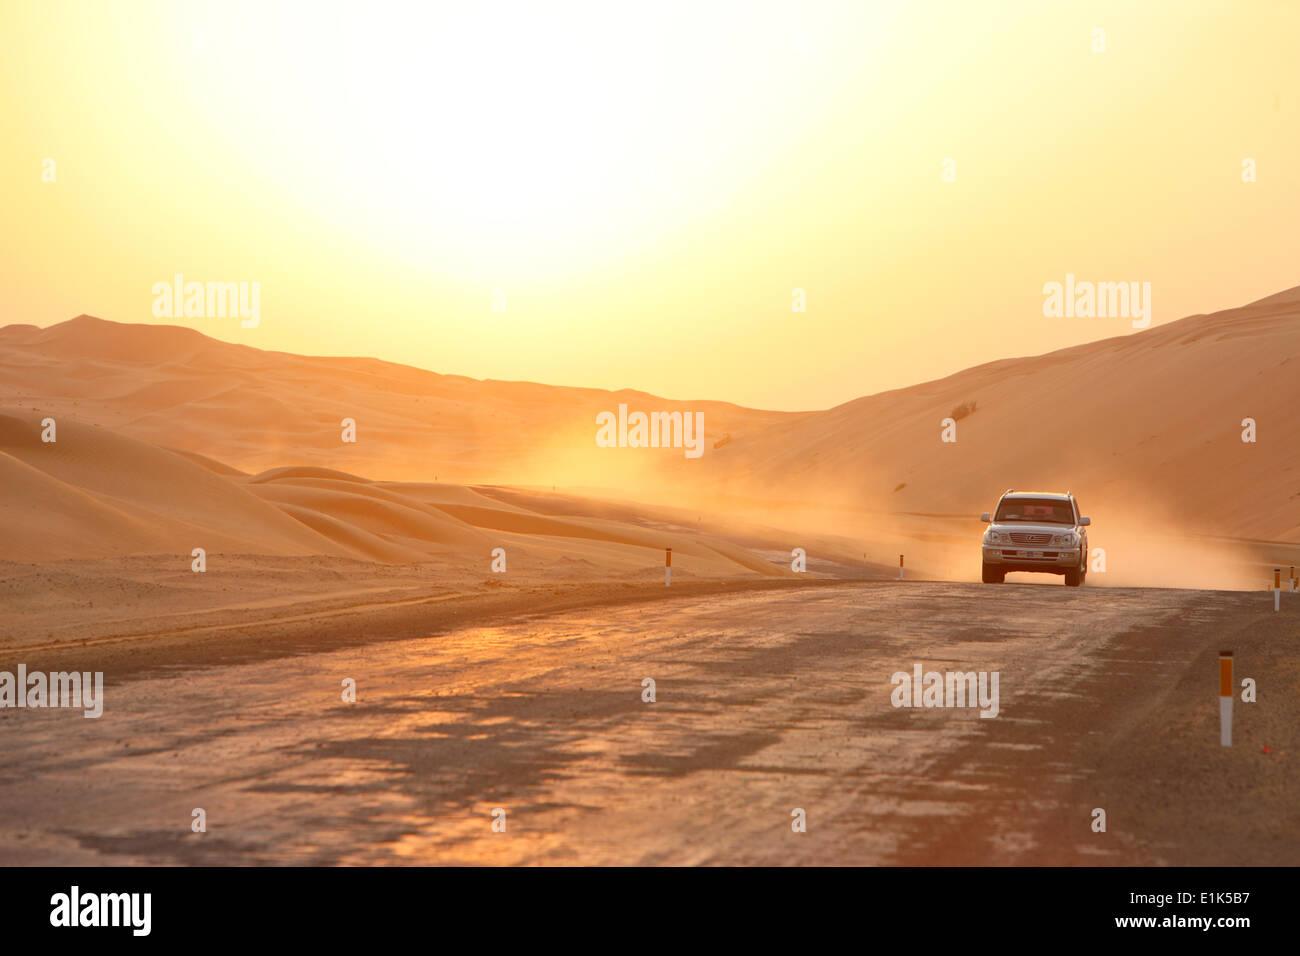 4-wheel drive in Liwa desert - Stock Image